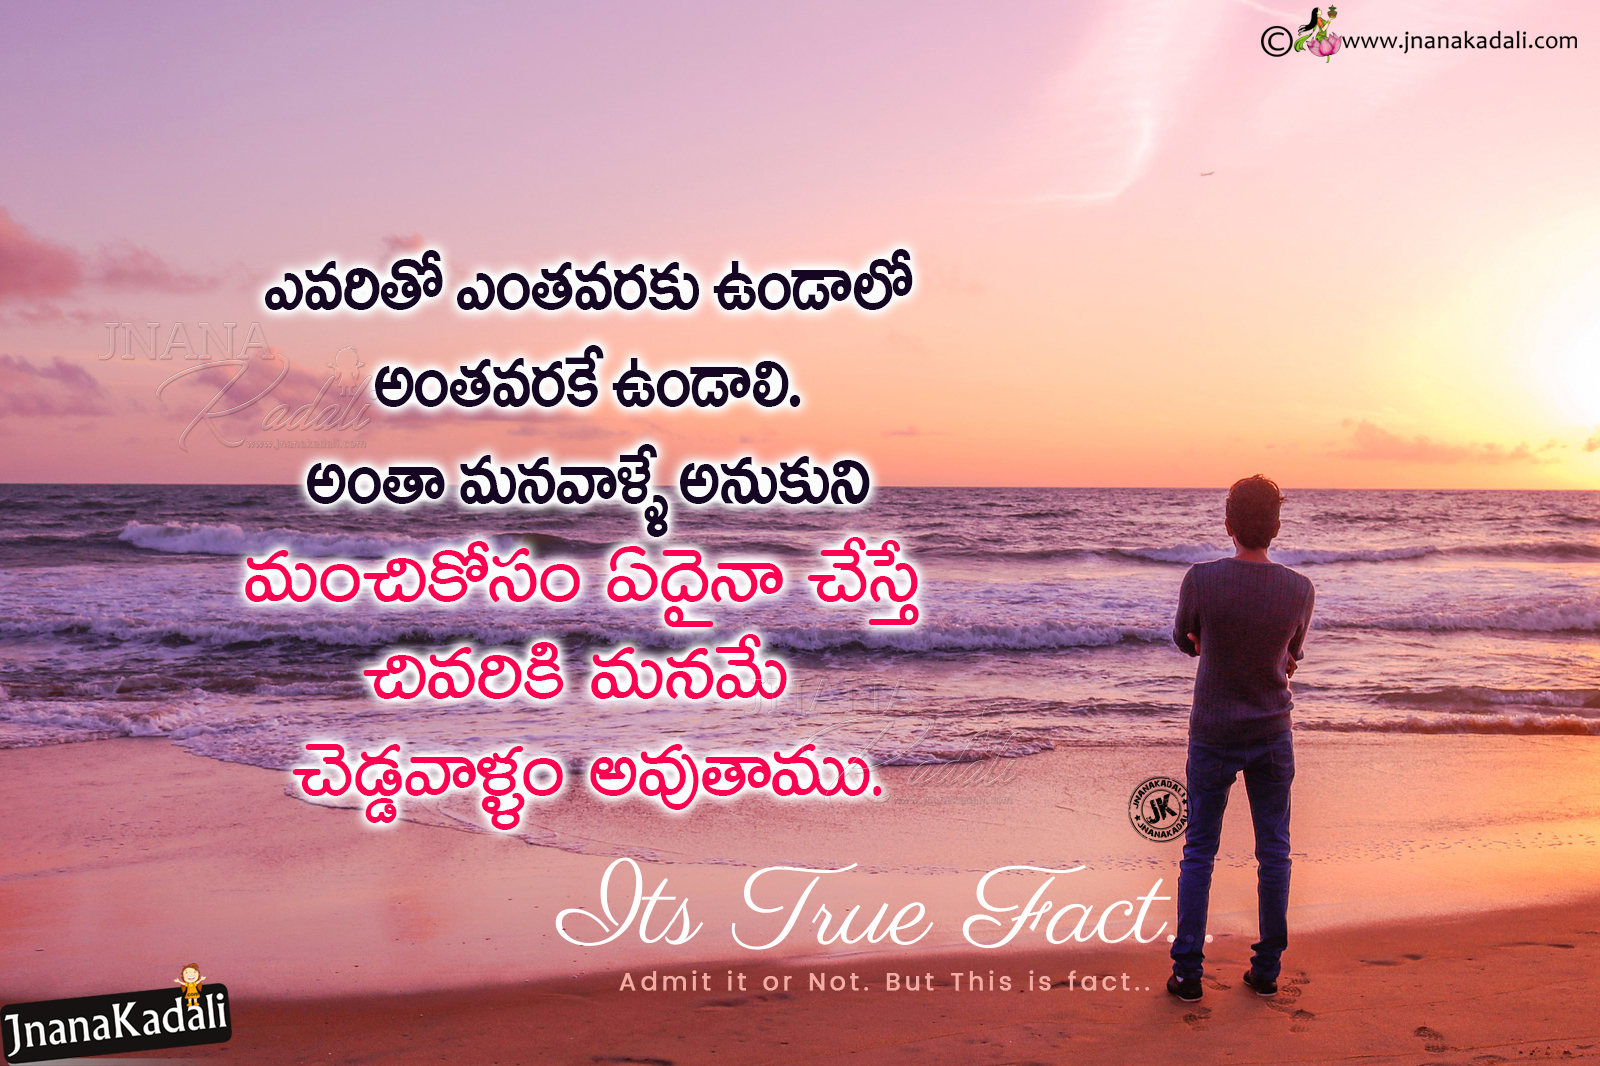 Famous Telugu Relationship Quotes Hd Wallpapers Free Download Jnana Kadali Com Telugu Quotes English Quotes Hindi Quotes Tamil Quotes Dharmasandehalu